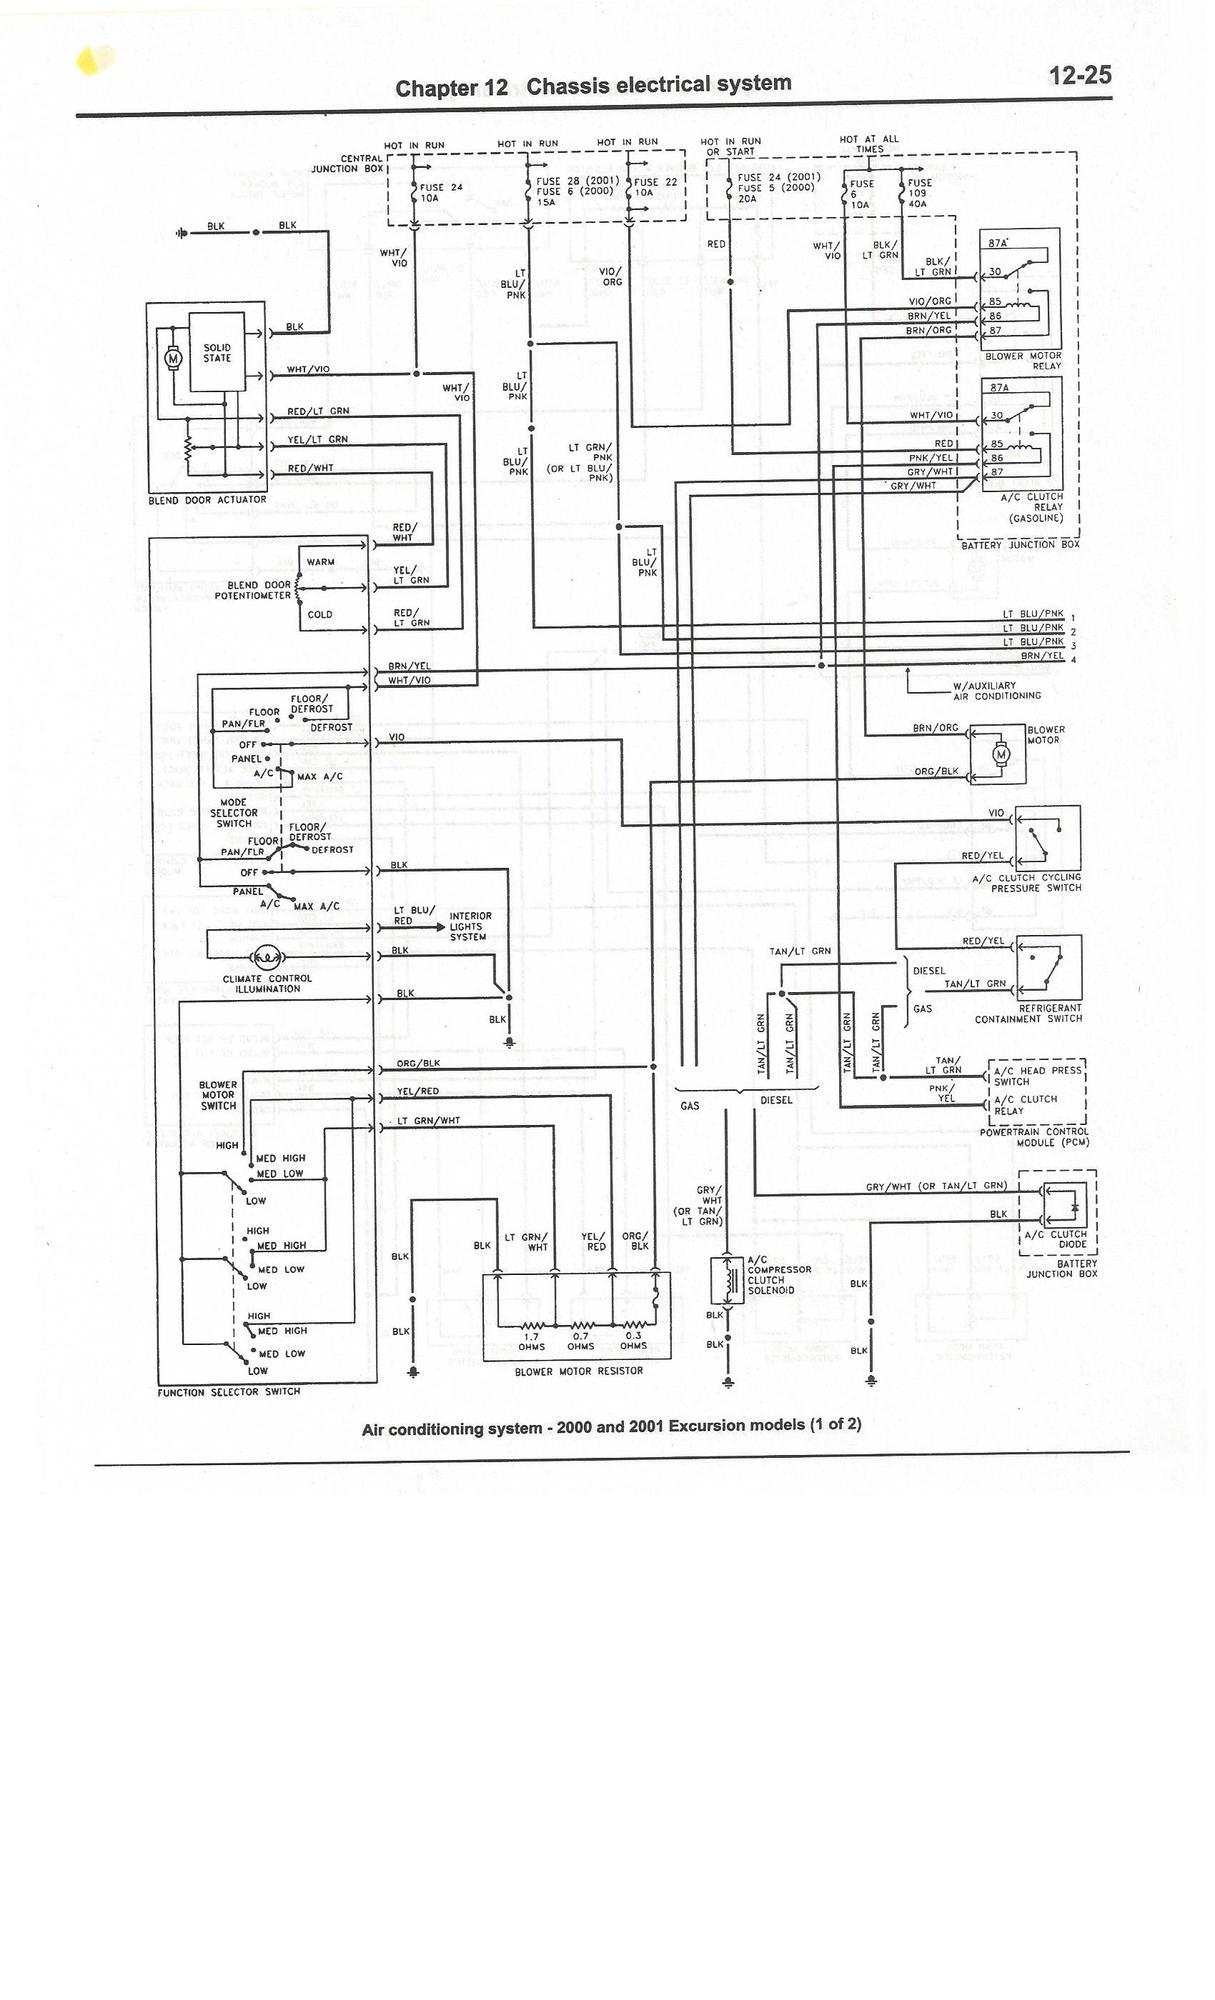 Complete Excursion Wiring Diagrams So Far